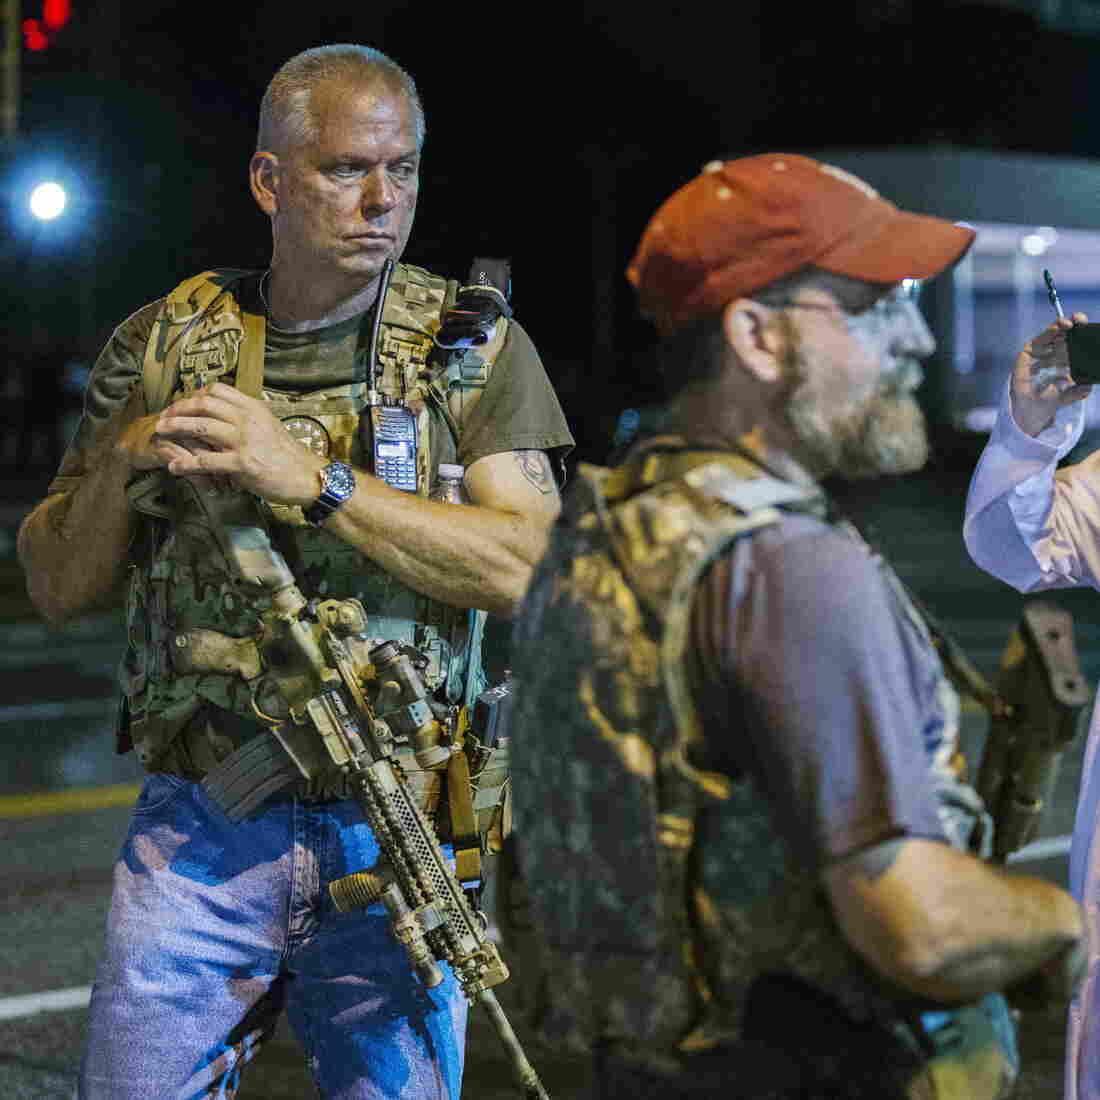 More Than 20 Arrested In Ferguson; Armed 'Oath Keepers' Walk Streets